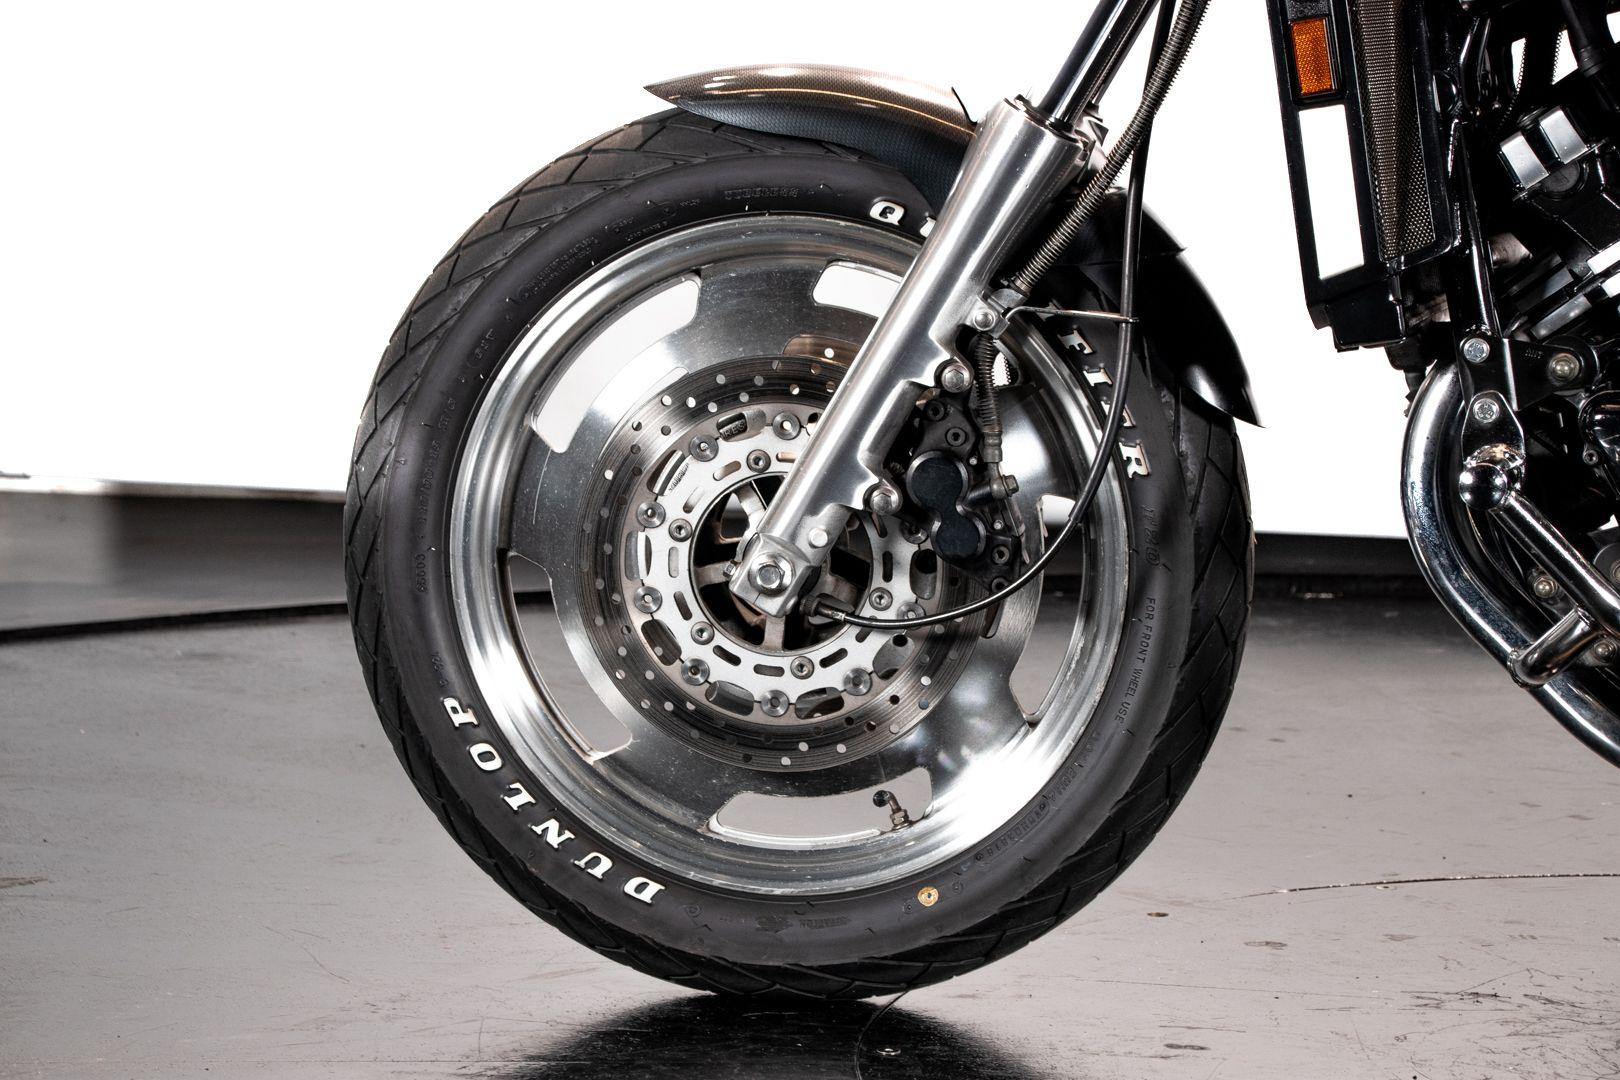 2001 Yamaha V MAX 73442